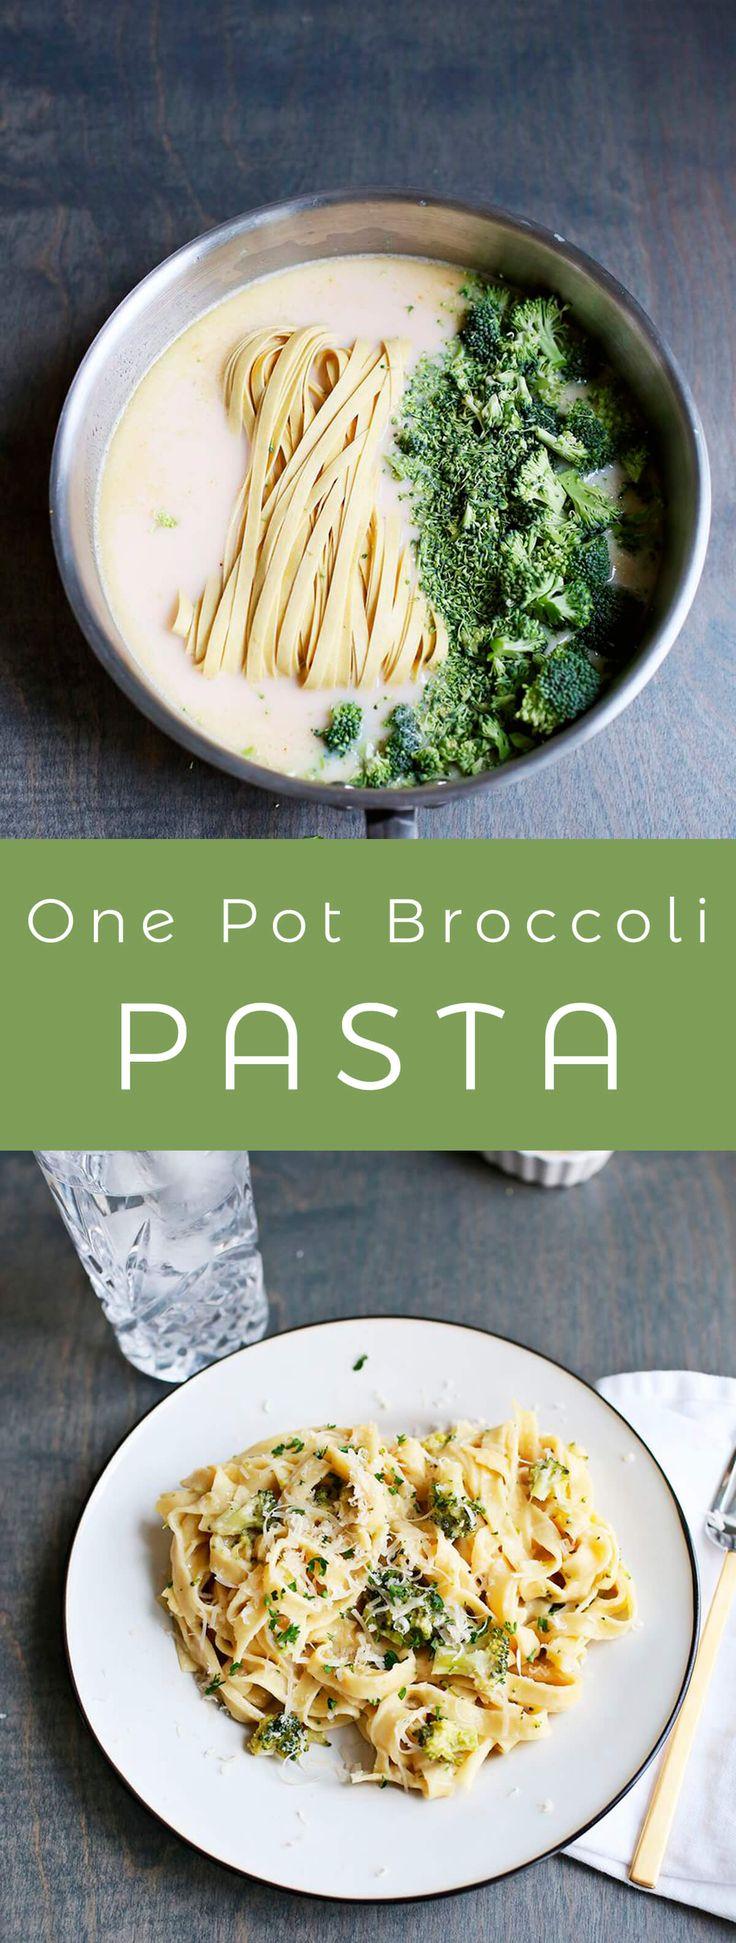 One pot creamy broccoli pasta